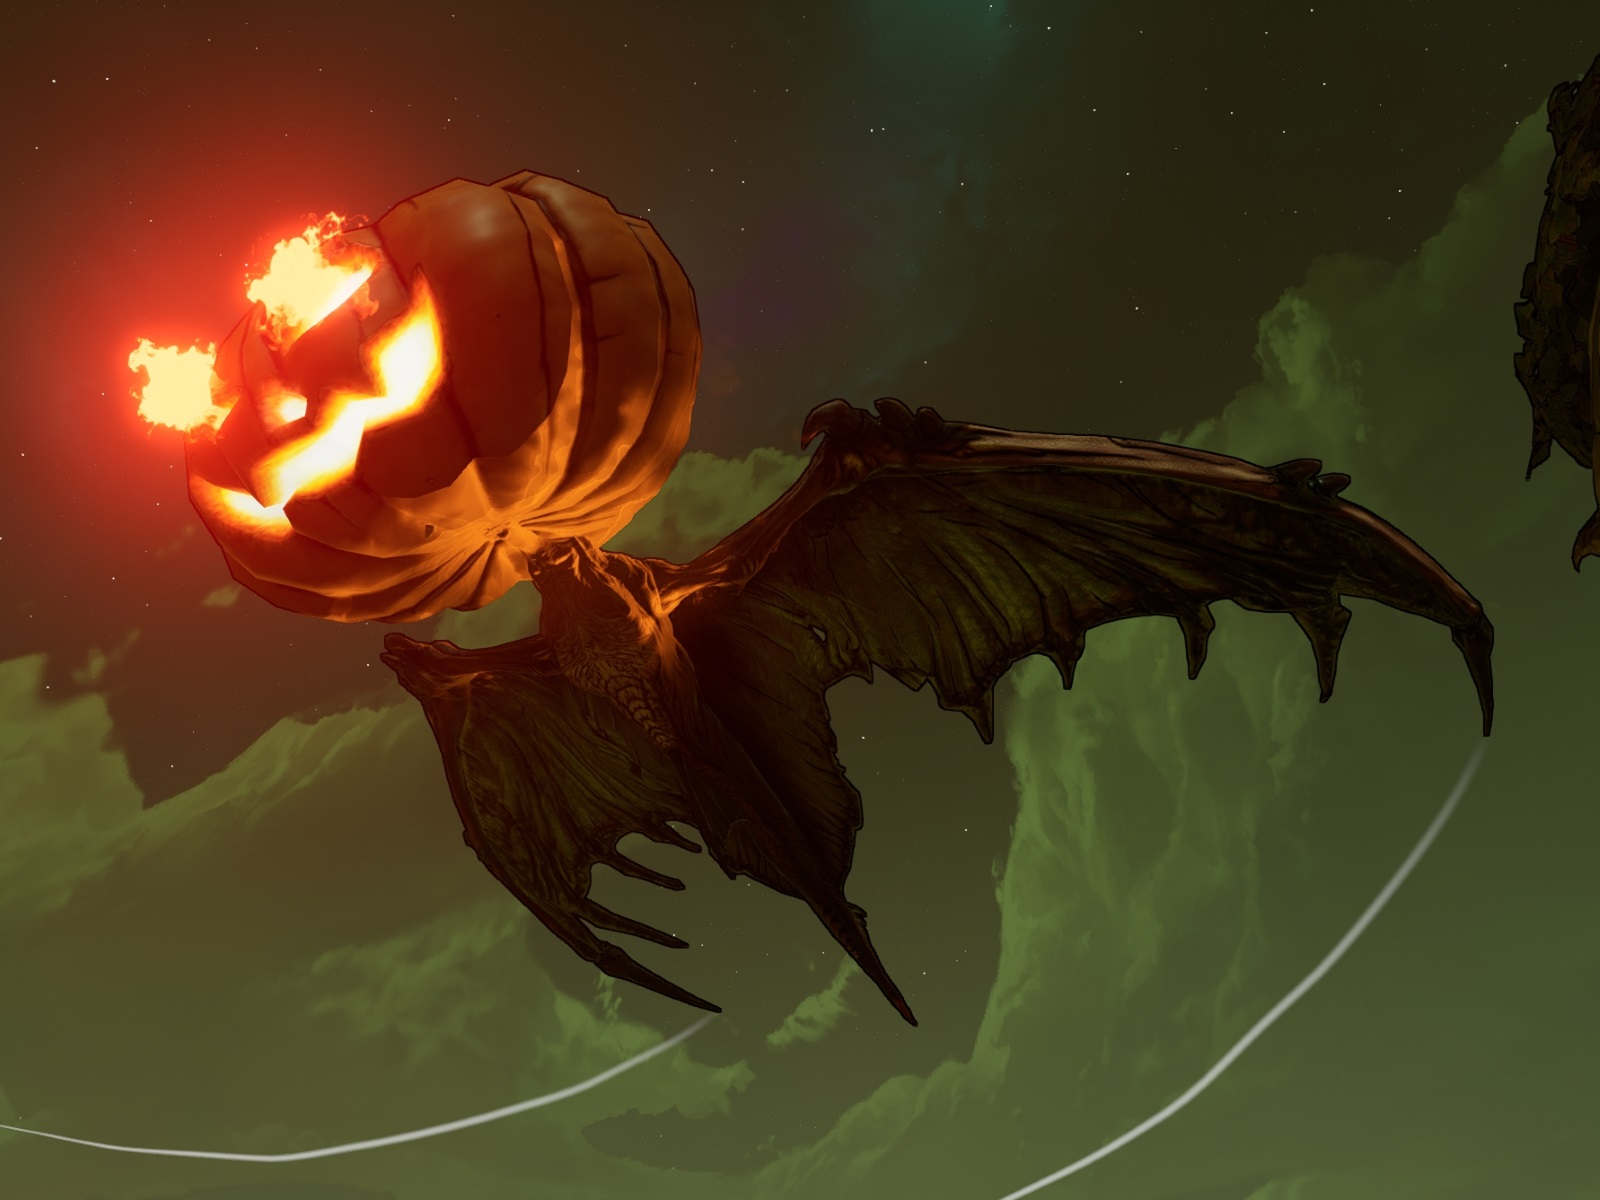 Rakk-O'-Lantern